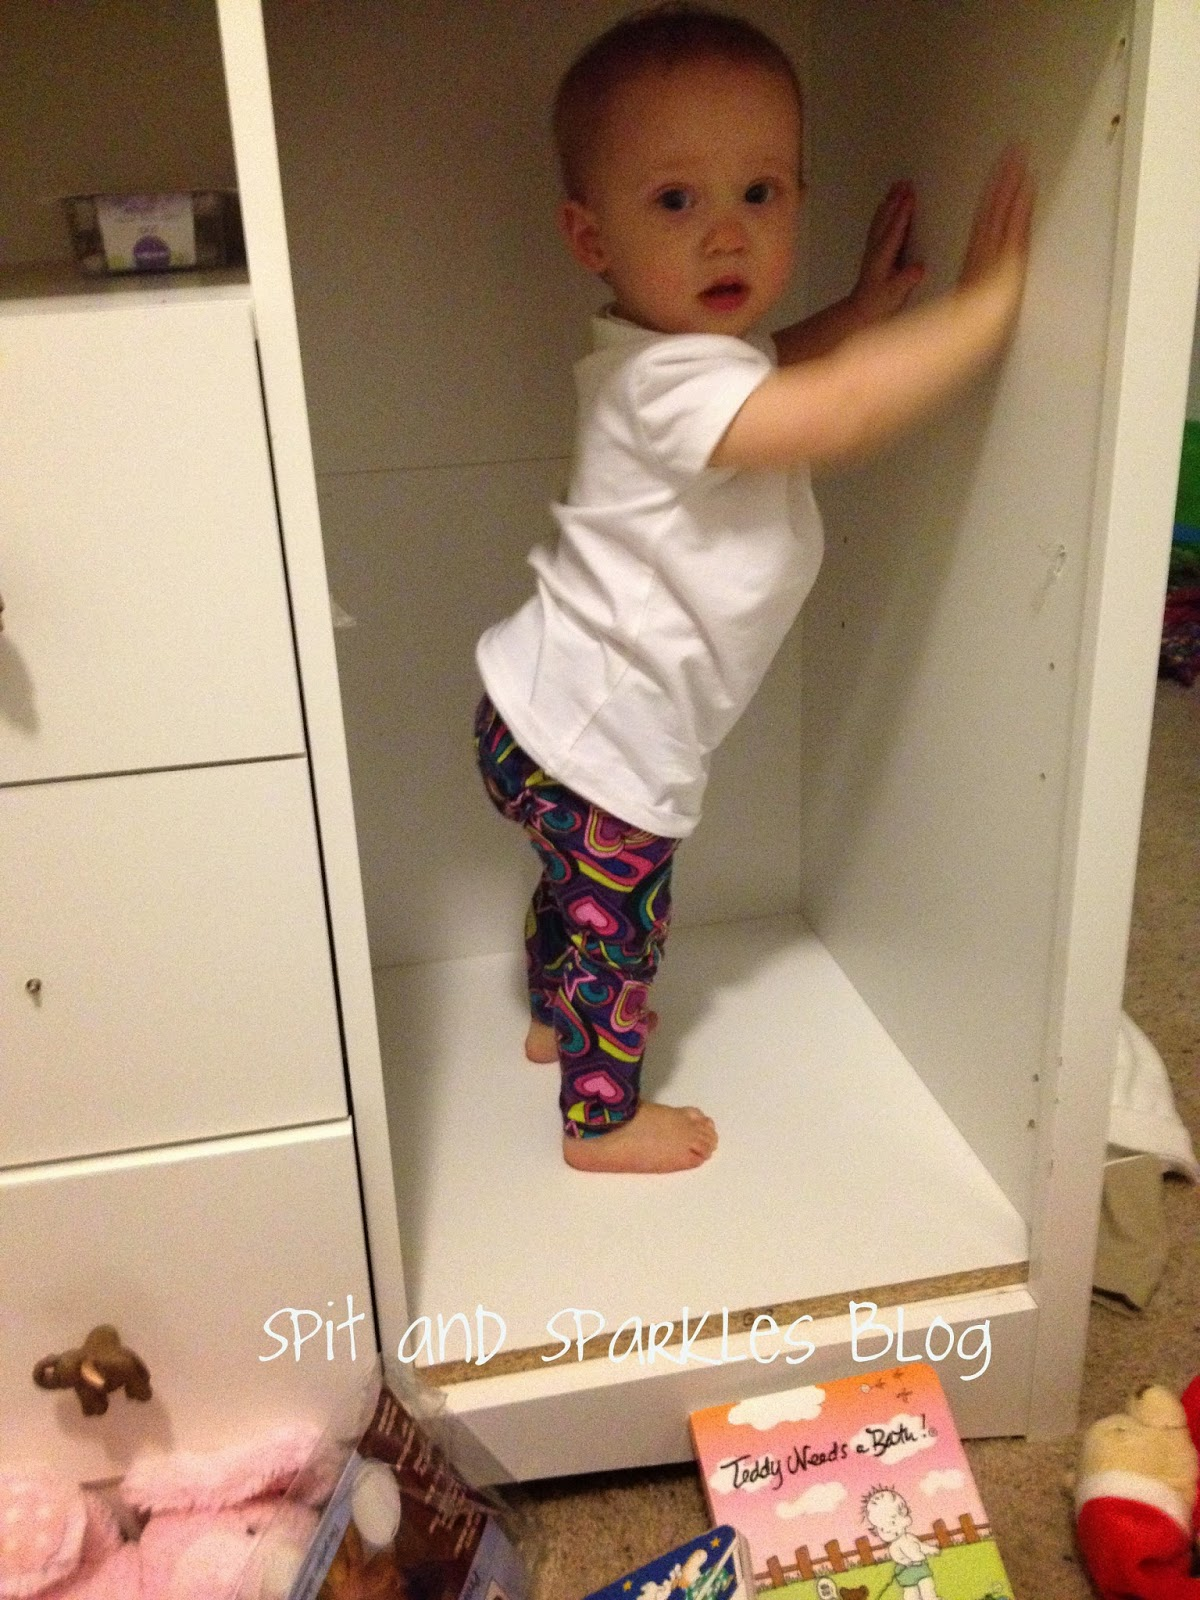 The secret to happier, stress-free parenting. #kids #parenting